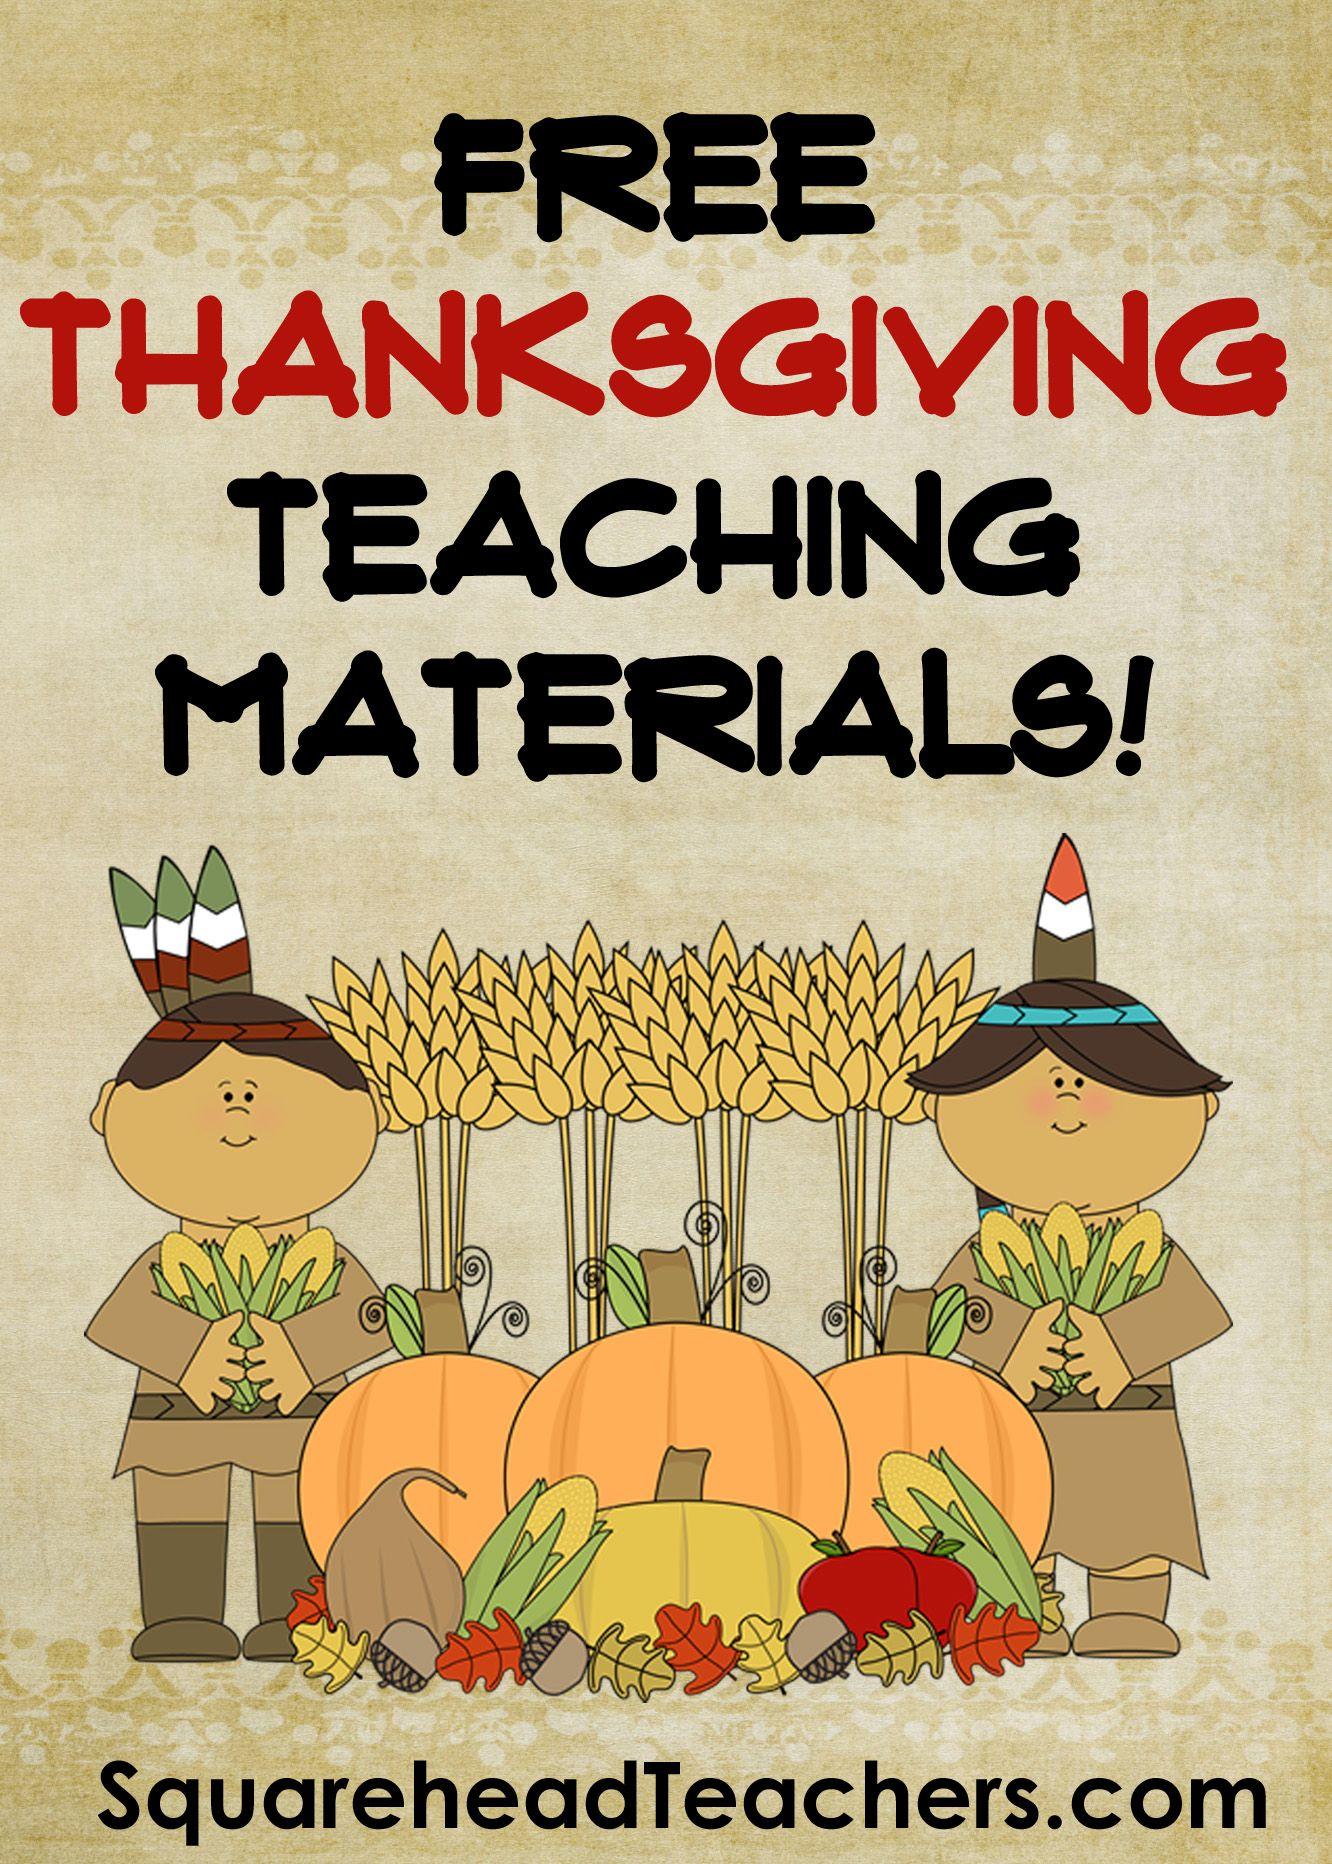 Squarehead Teachers Free Thanksgiving Printable